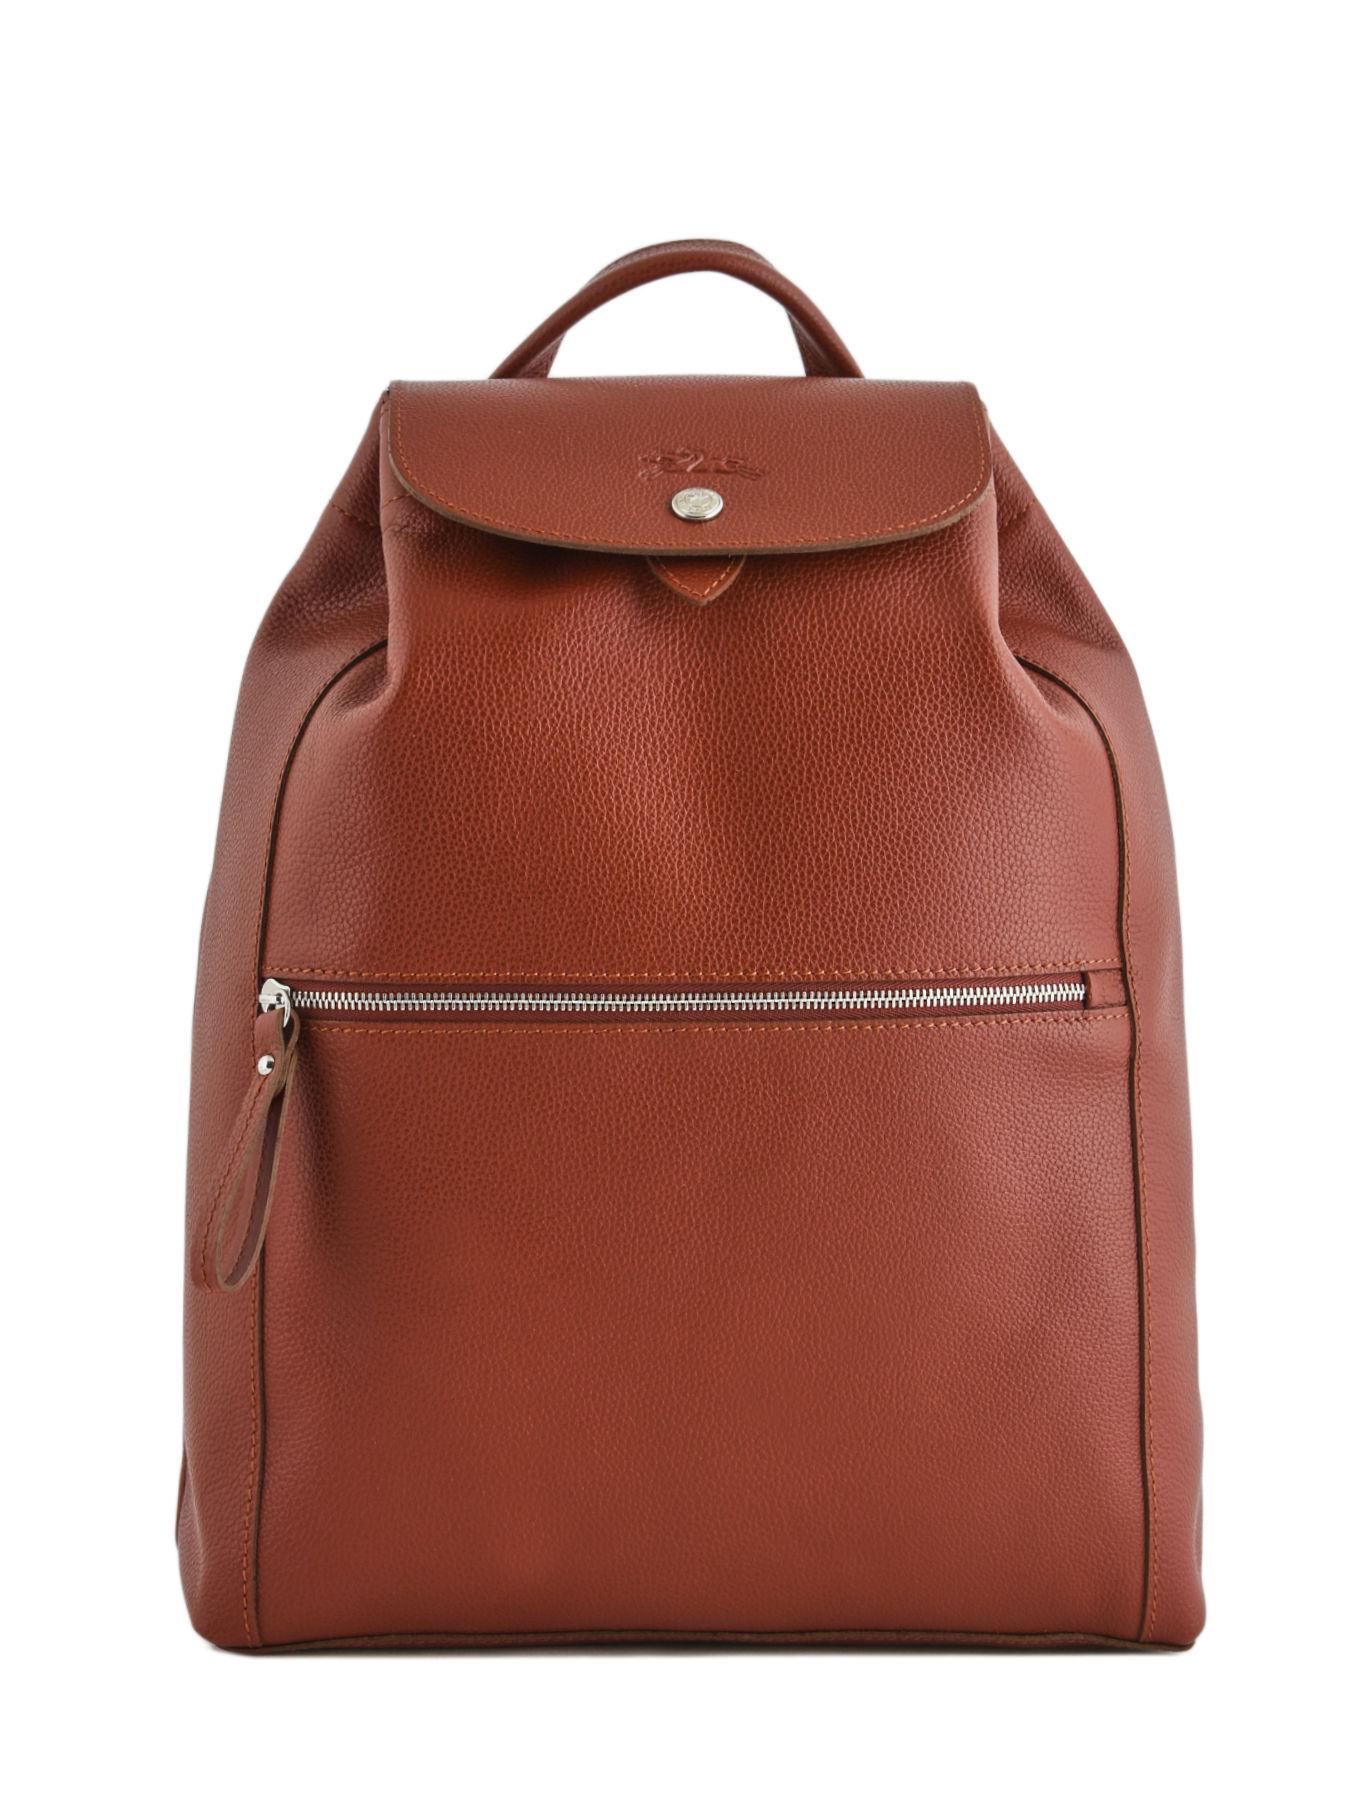 Leather backpack Le Foulonné LONGCHAMP